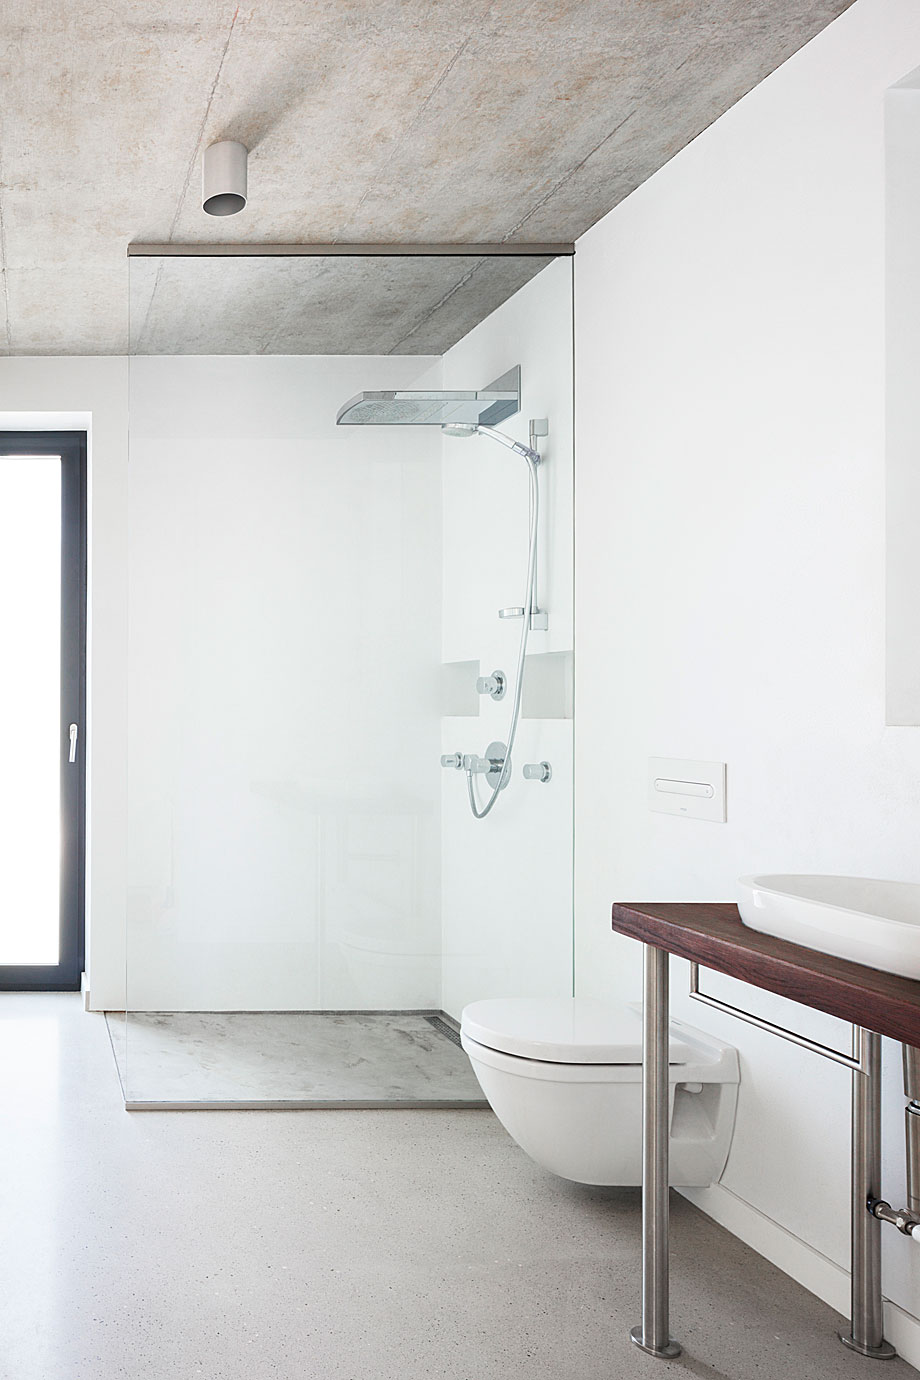 casa-unifamiliar-klanovice-adr-architects-13